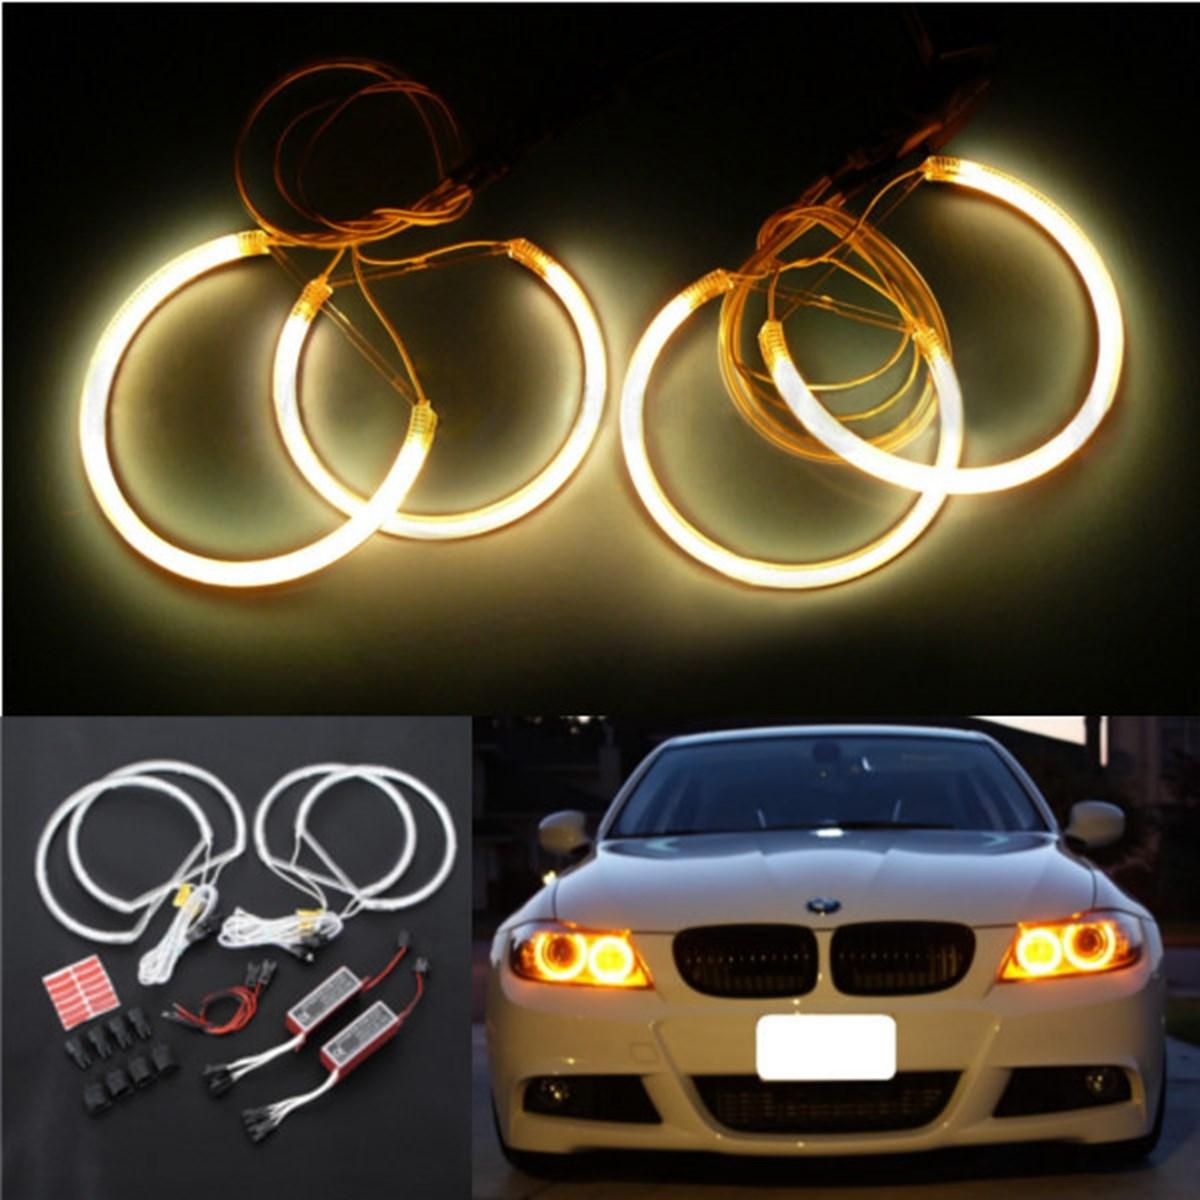 Lowest Price Car CCFL LED Angel Eye Headlights LED Chip Car Light White Yellow 6000K Auto Headlight For BMW 3 Serie E46 Sedan<br><br>Aliexpress